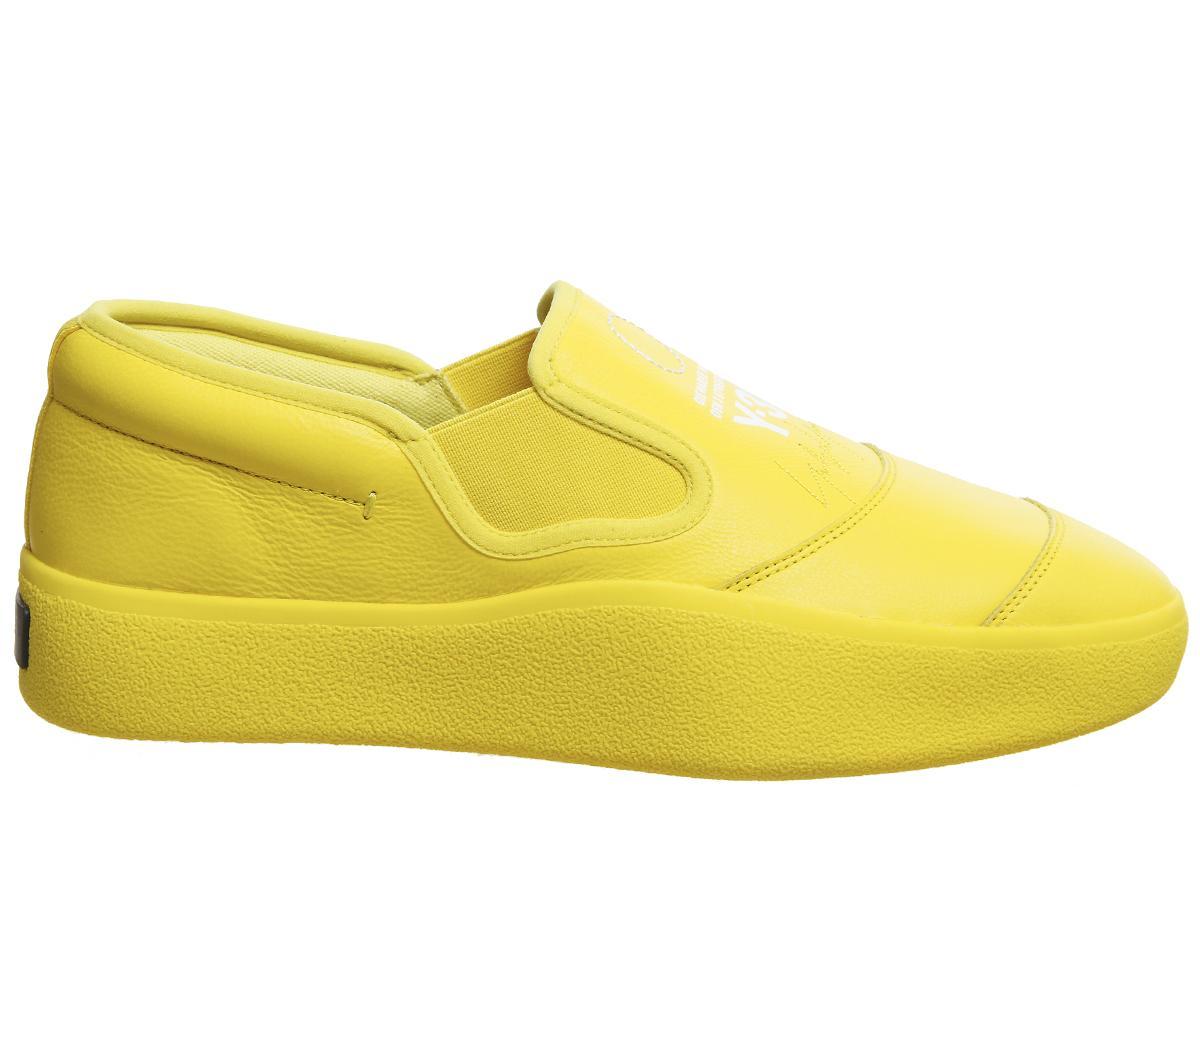 52d90d3cb Y-3 Tangutsu Slip On Sneakers Yellow in Yellow - Lyst